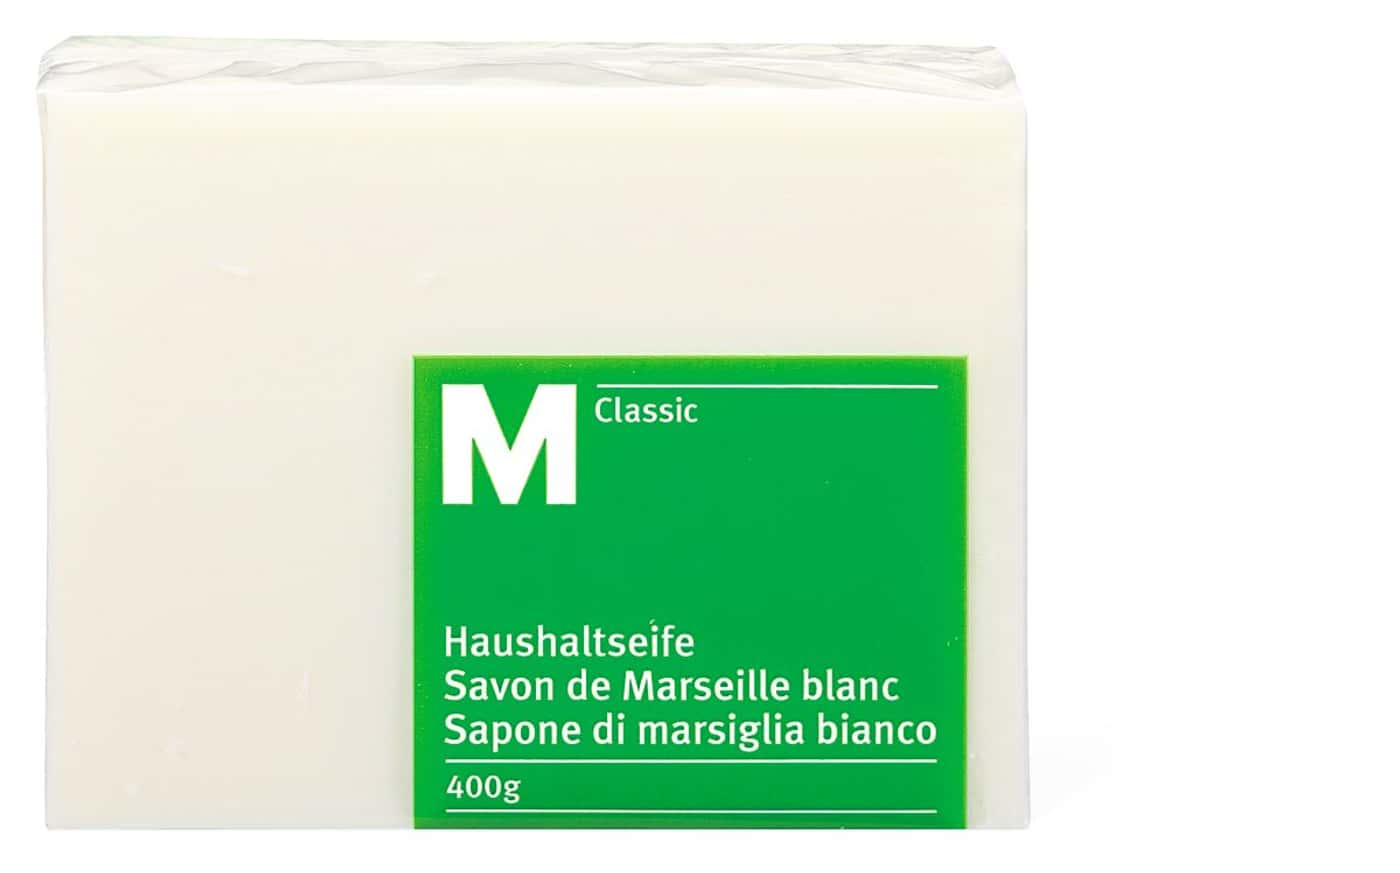 the blanc migros